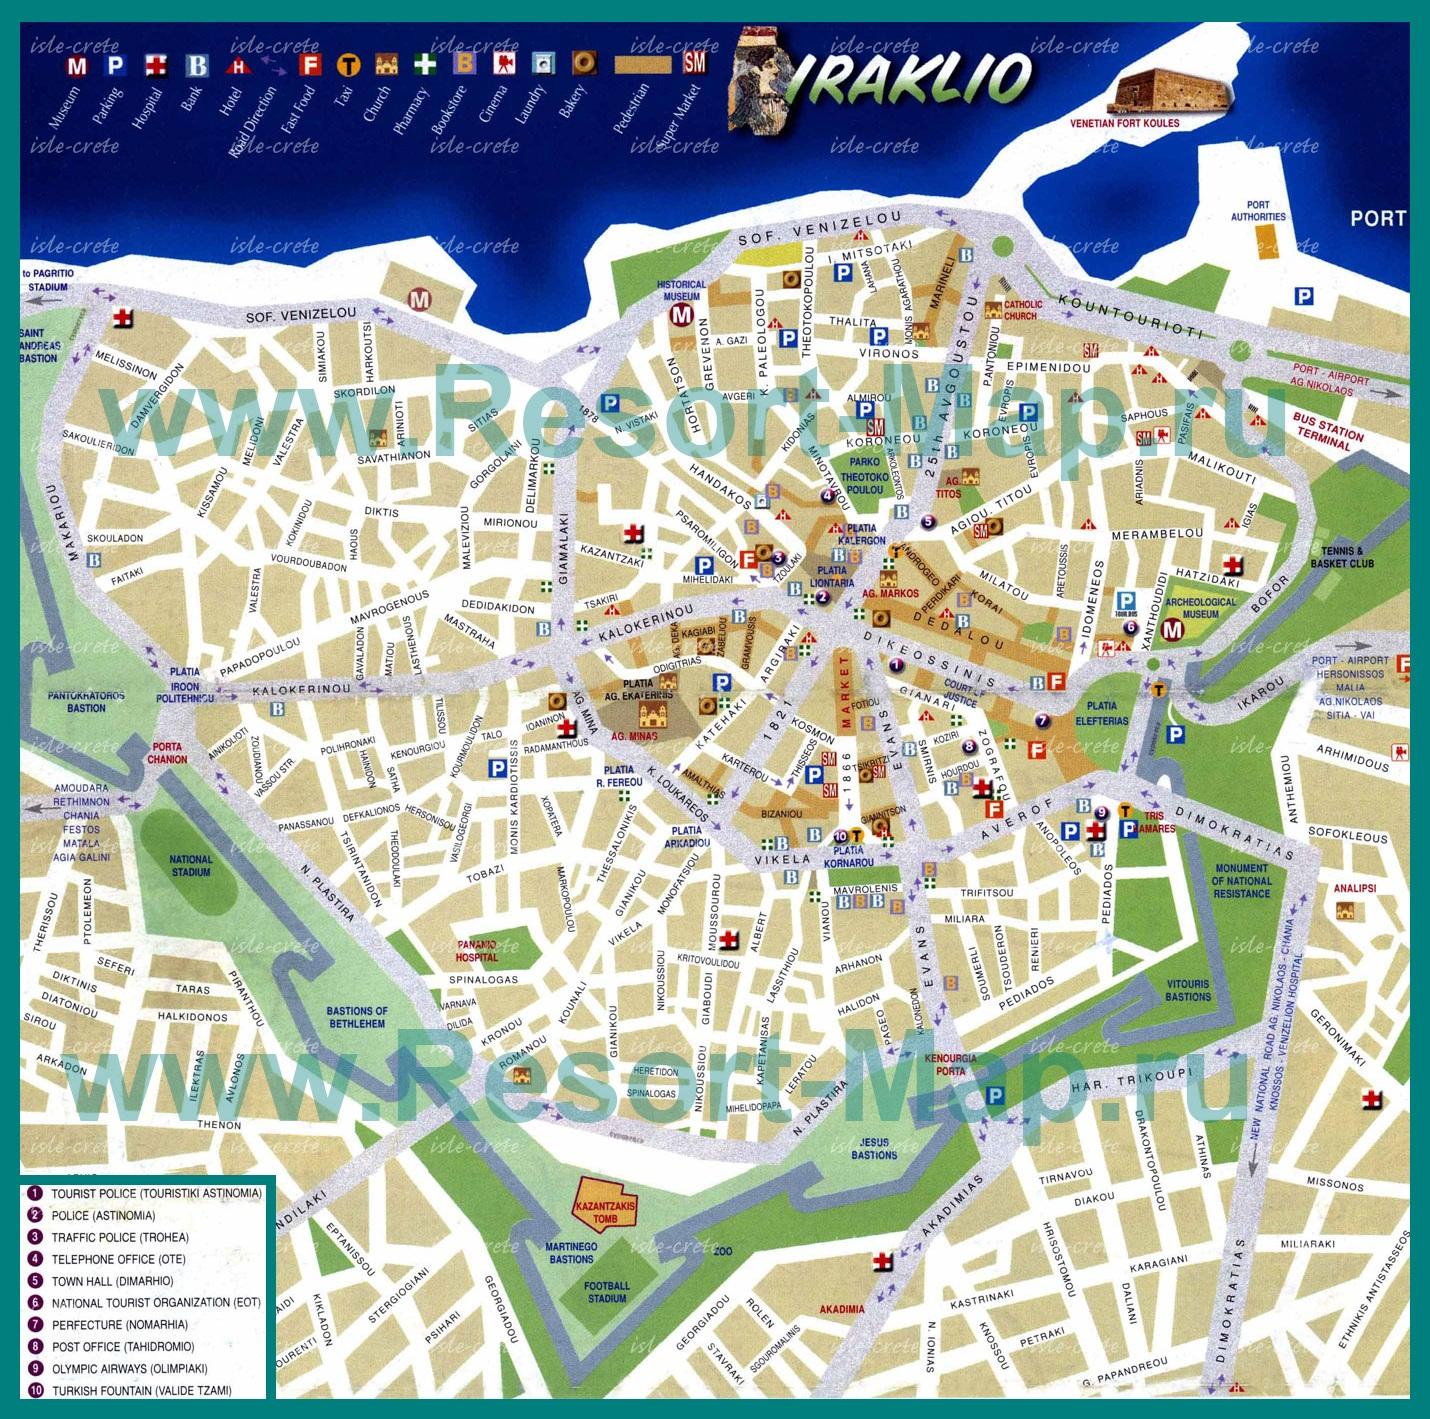 Карта С Отелями Родоса - belarusachka: http://belarusachka.weebly.com/blog/karta-s-otelyami-rodosa